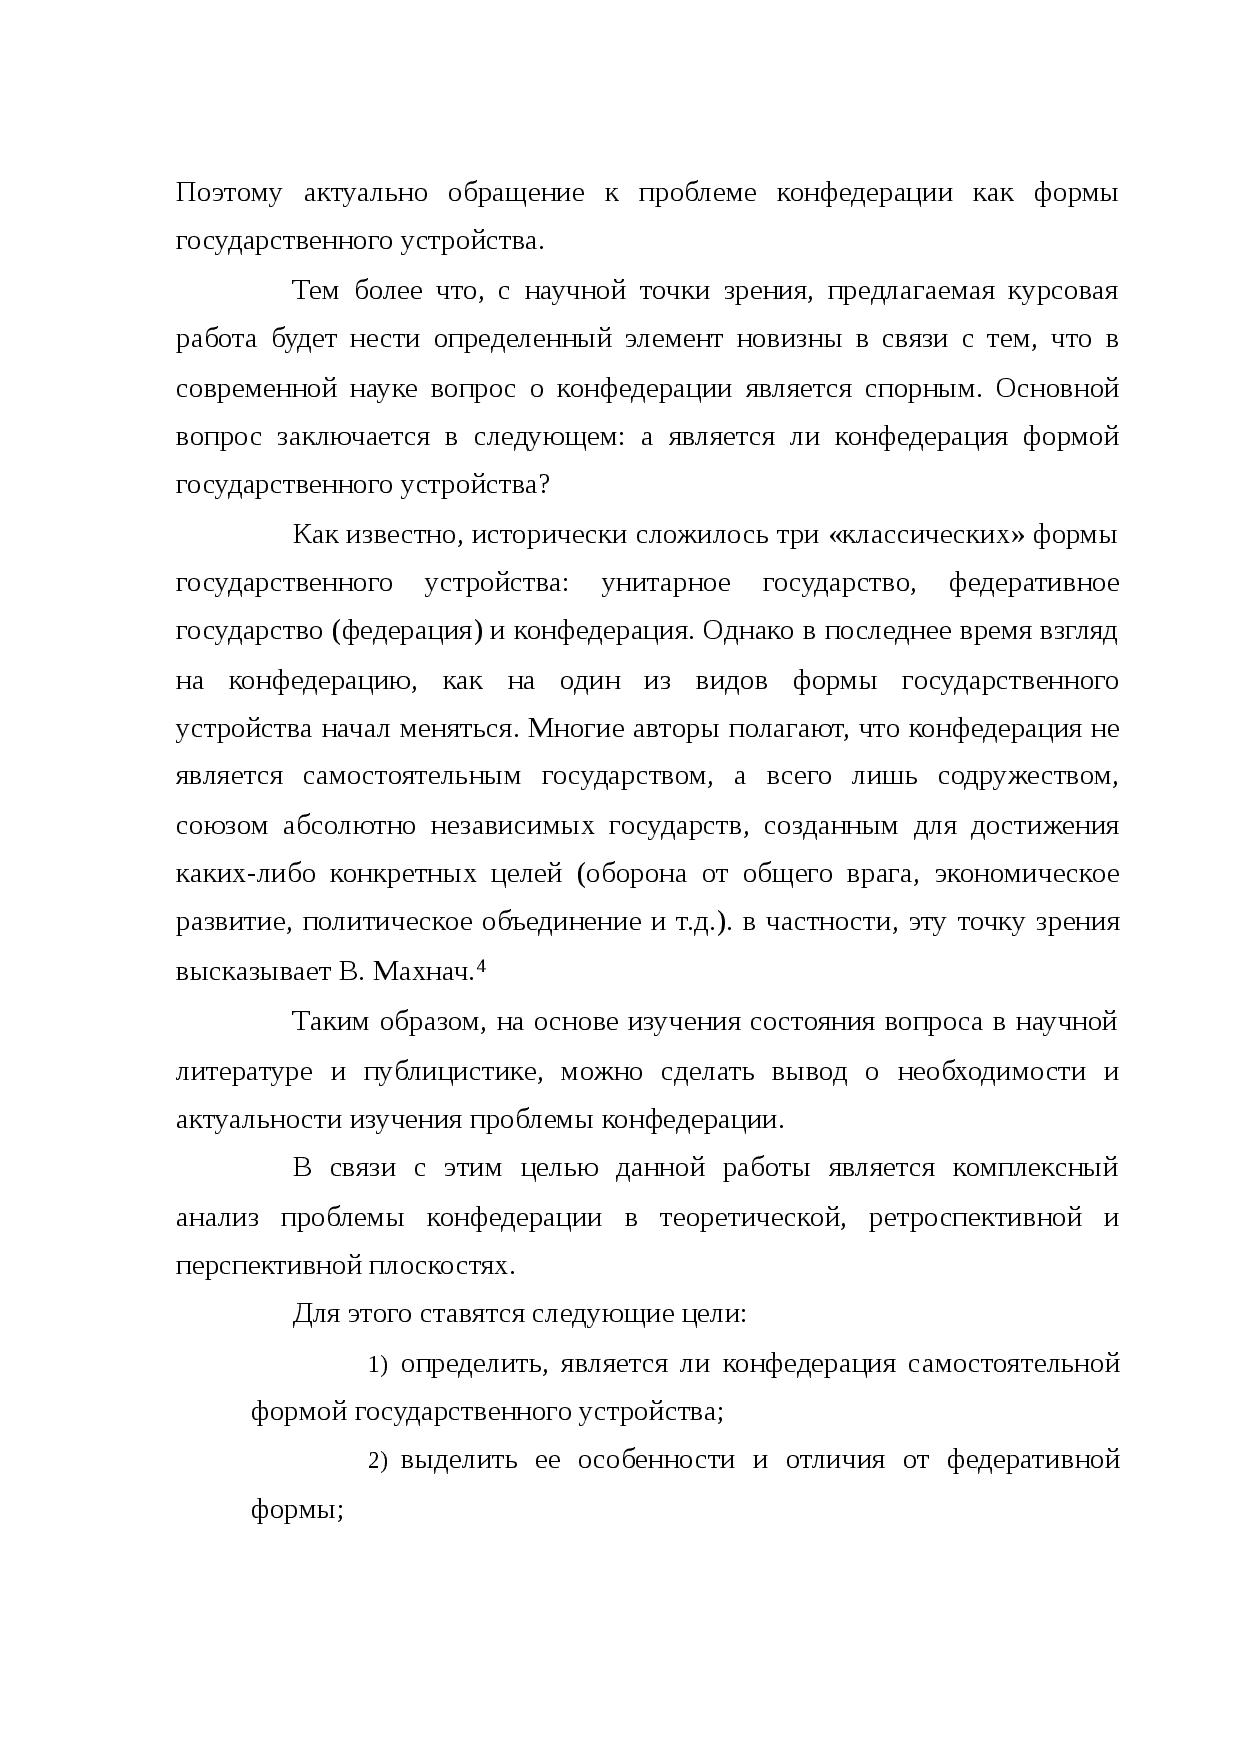 Конфедерация — википедия